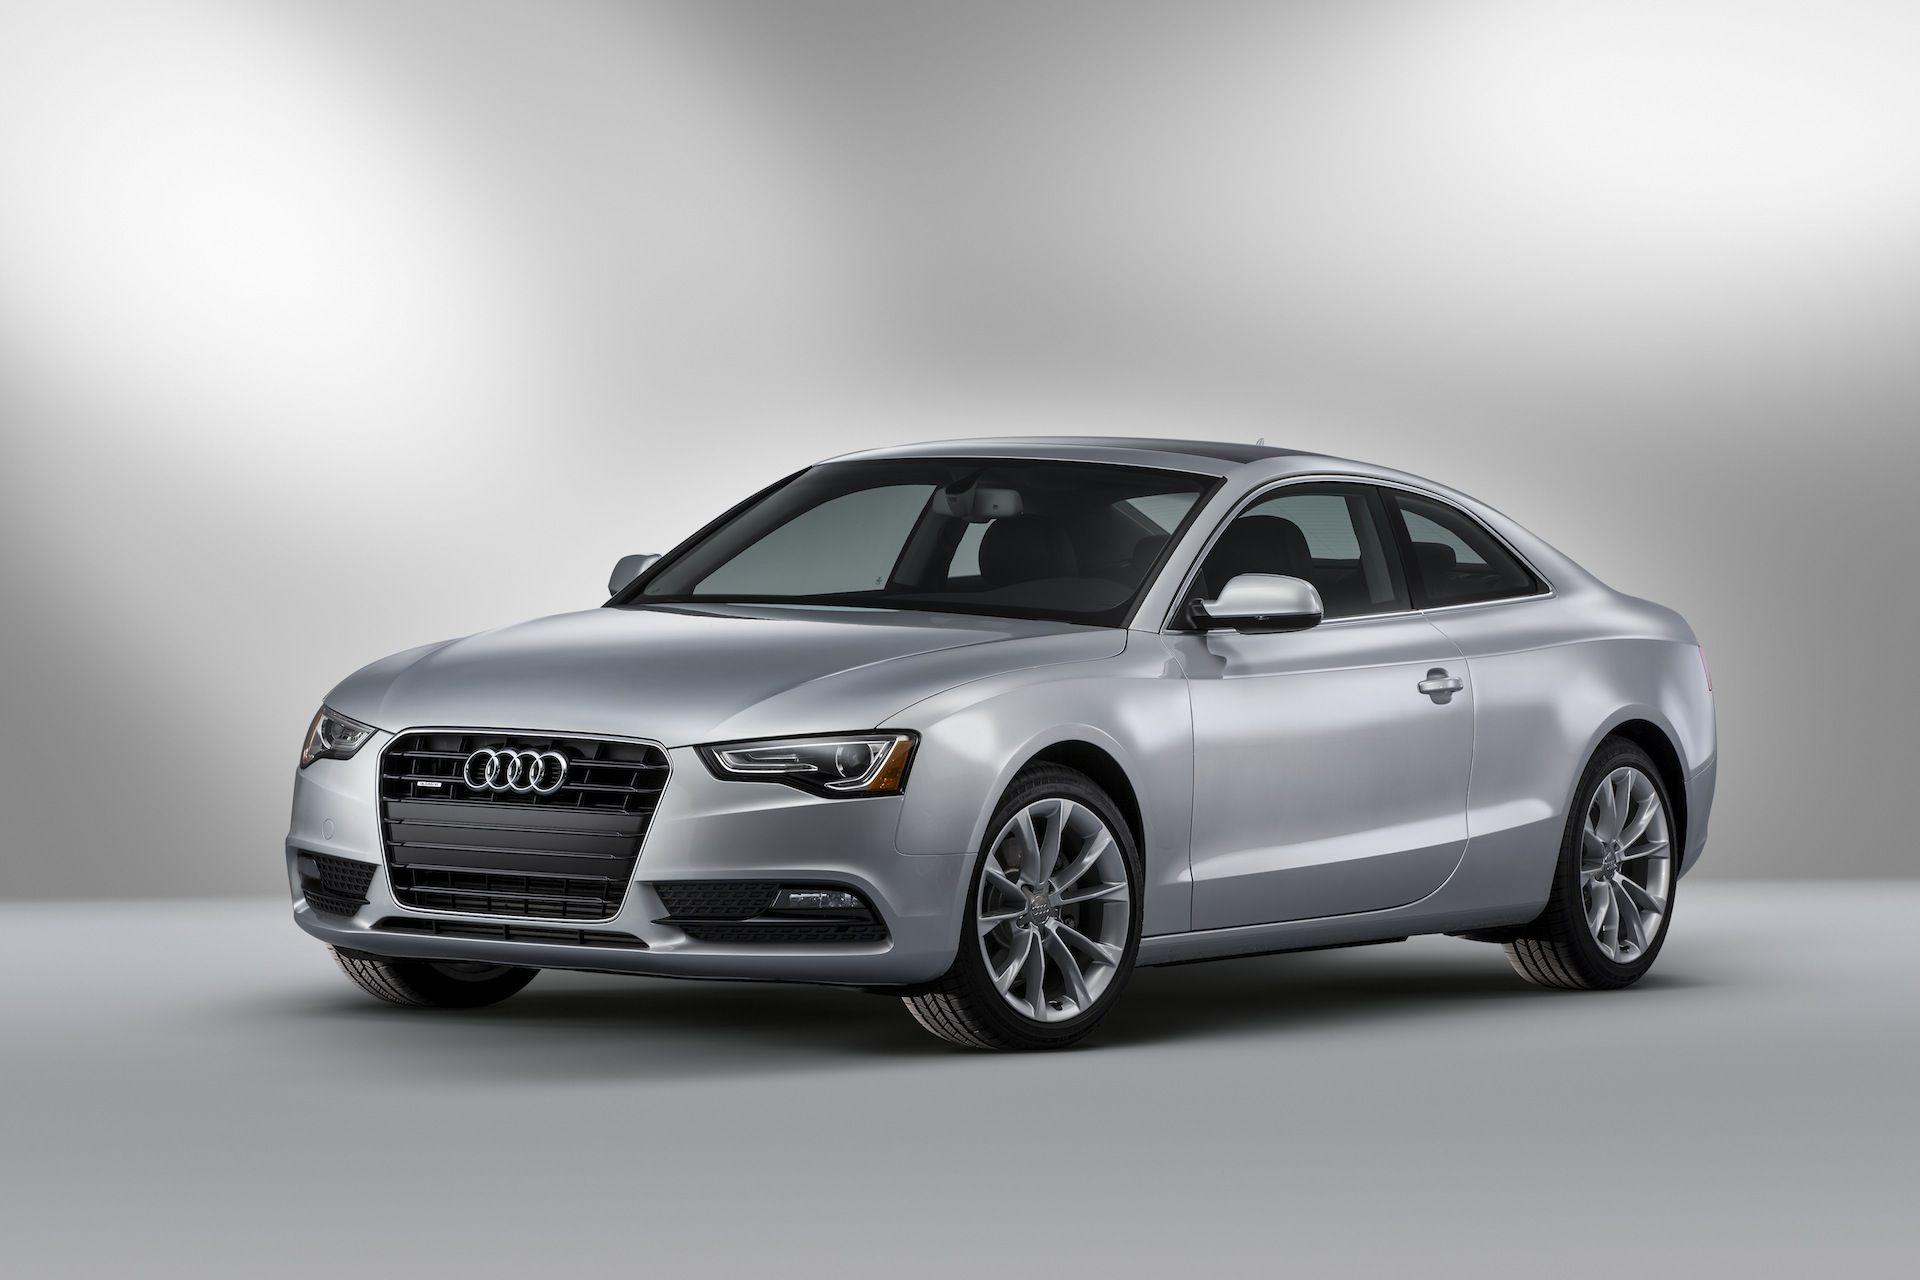 2014 Audi A5 Release Date | Tags : 2014 Audi A5 For Sale, 2014 Audi